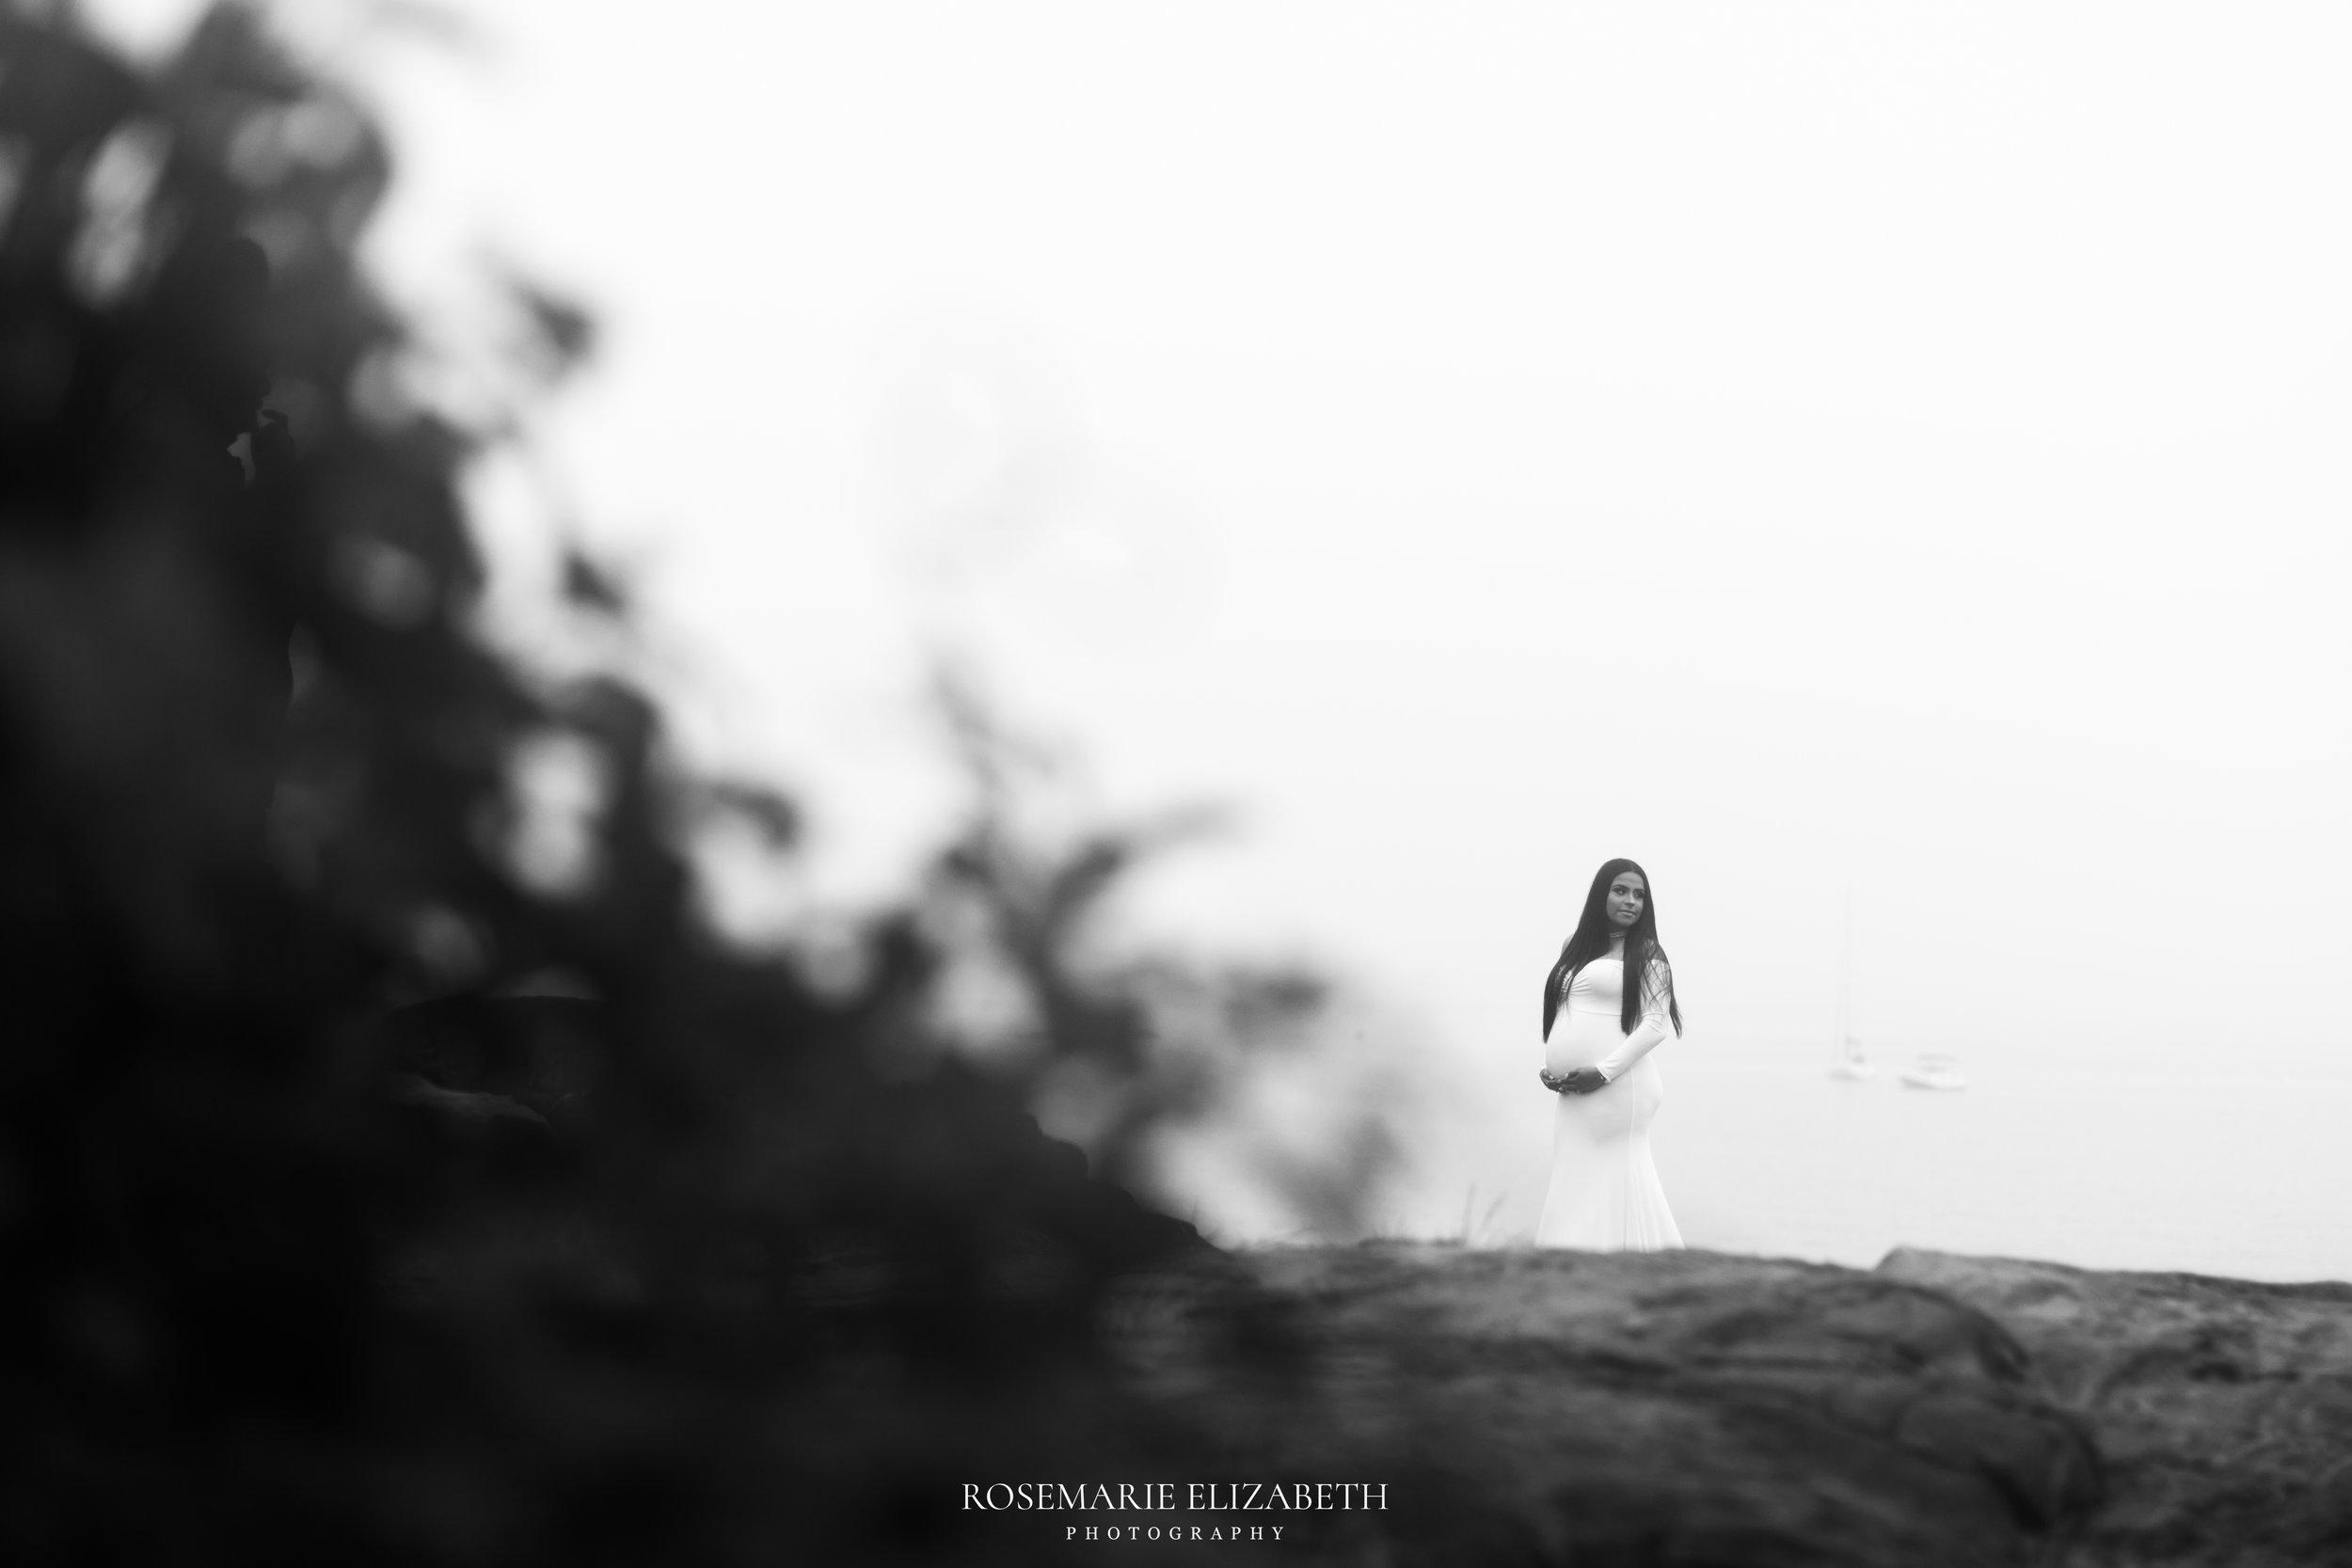 RosemarieElizabethPhotography-3045.jpg